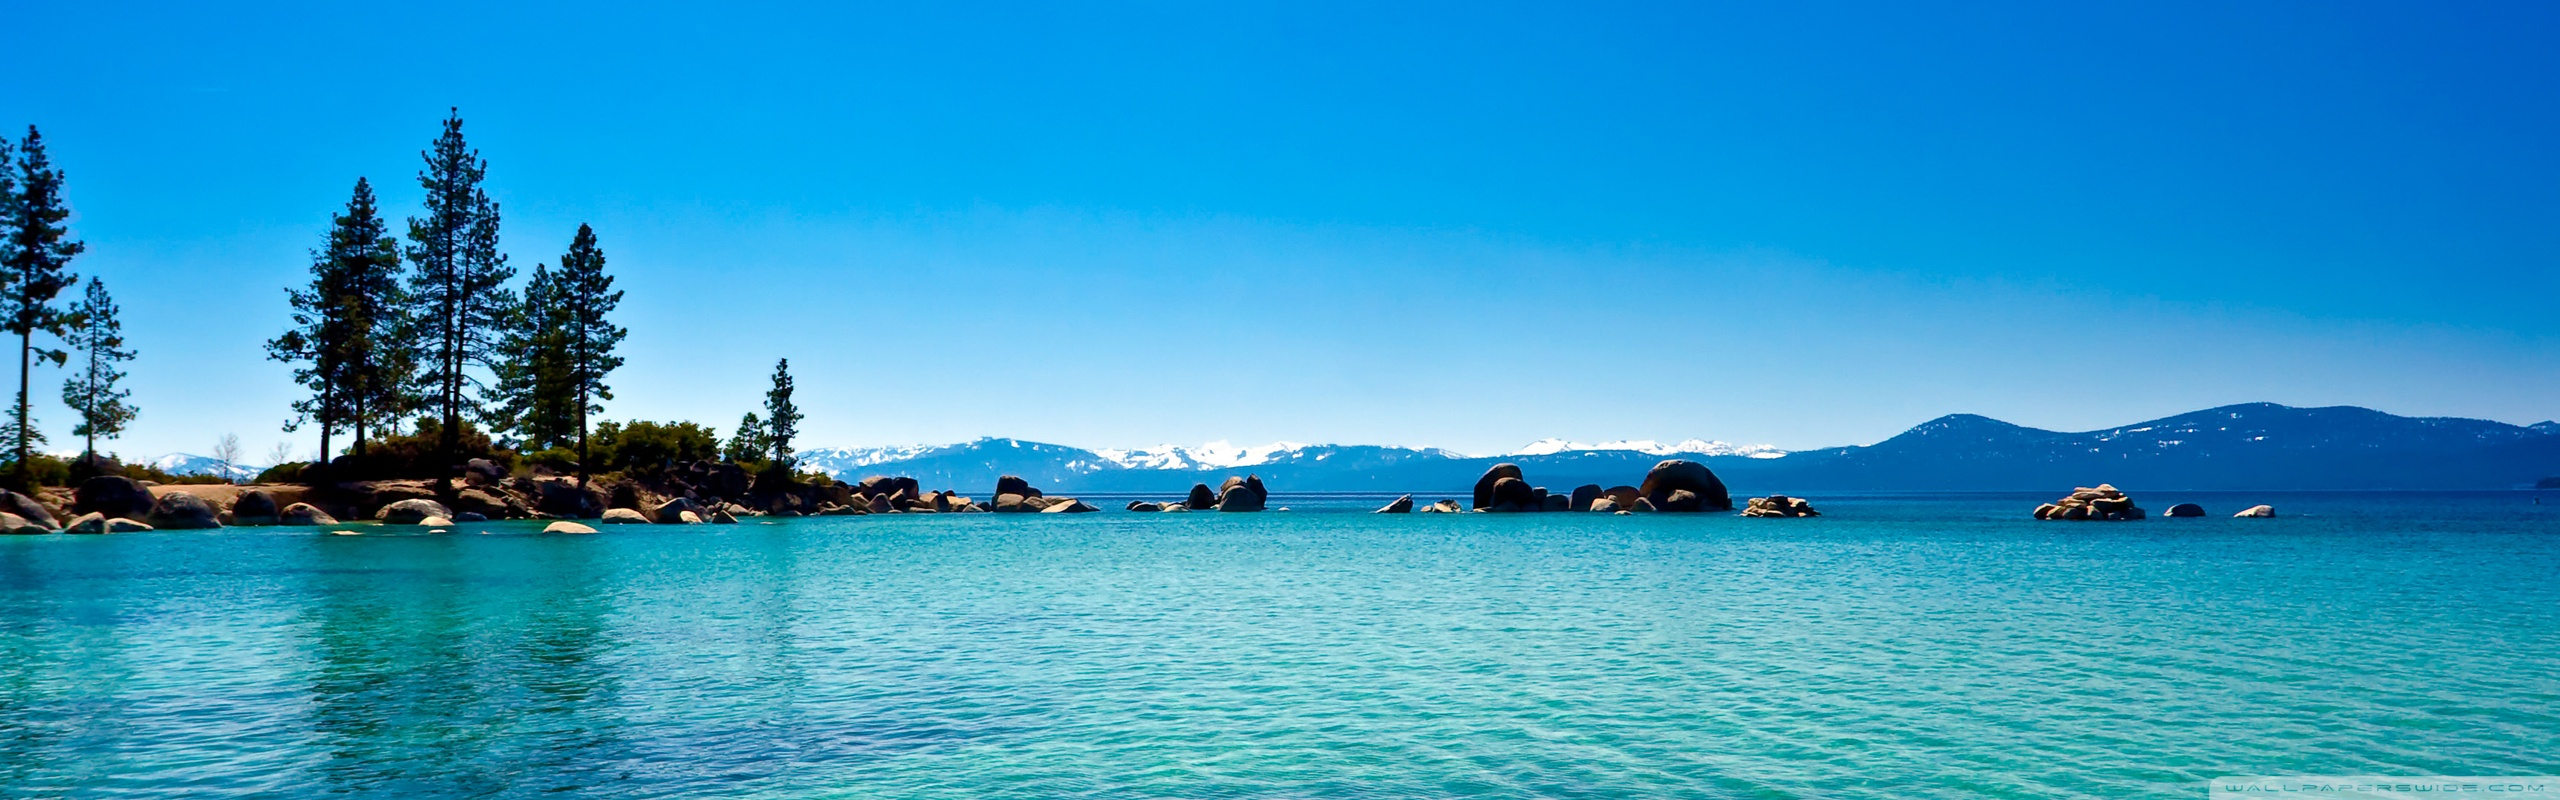 Lake tahoe california 4k hd desktop wallpaper for 4k ultra hd tv dual wide voltagebd Gallery